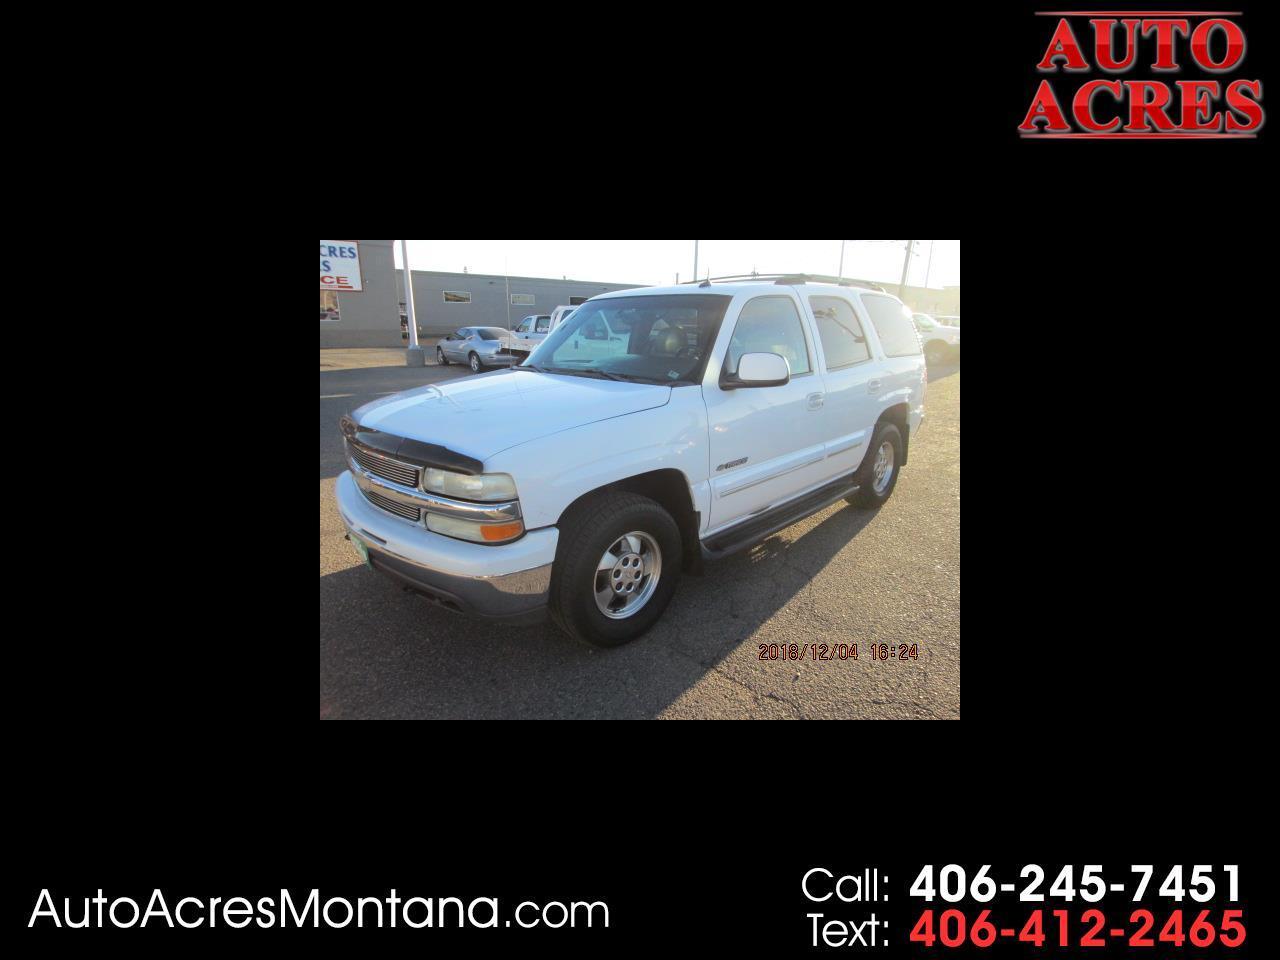 2002 Chevrolet Tahoe 4dr 1500 LT